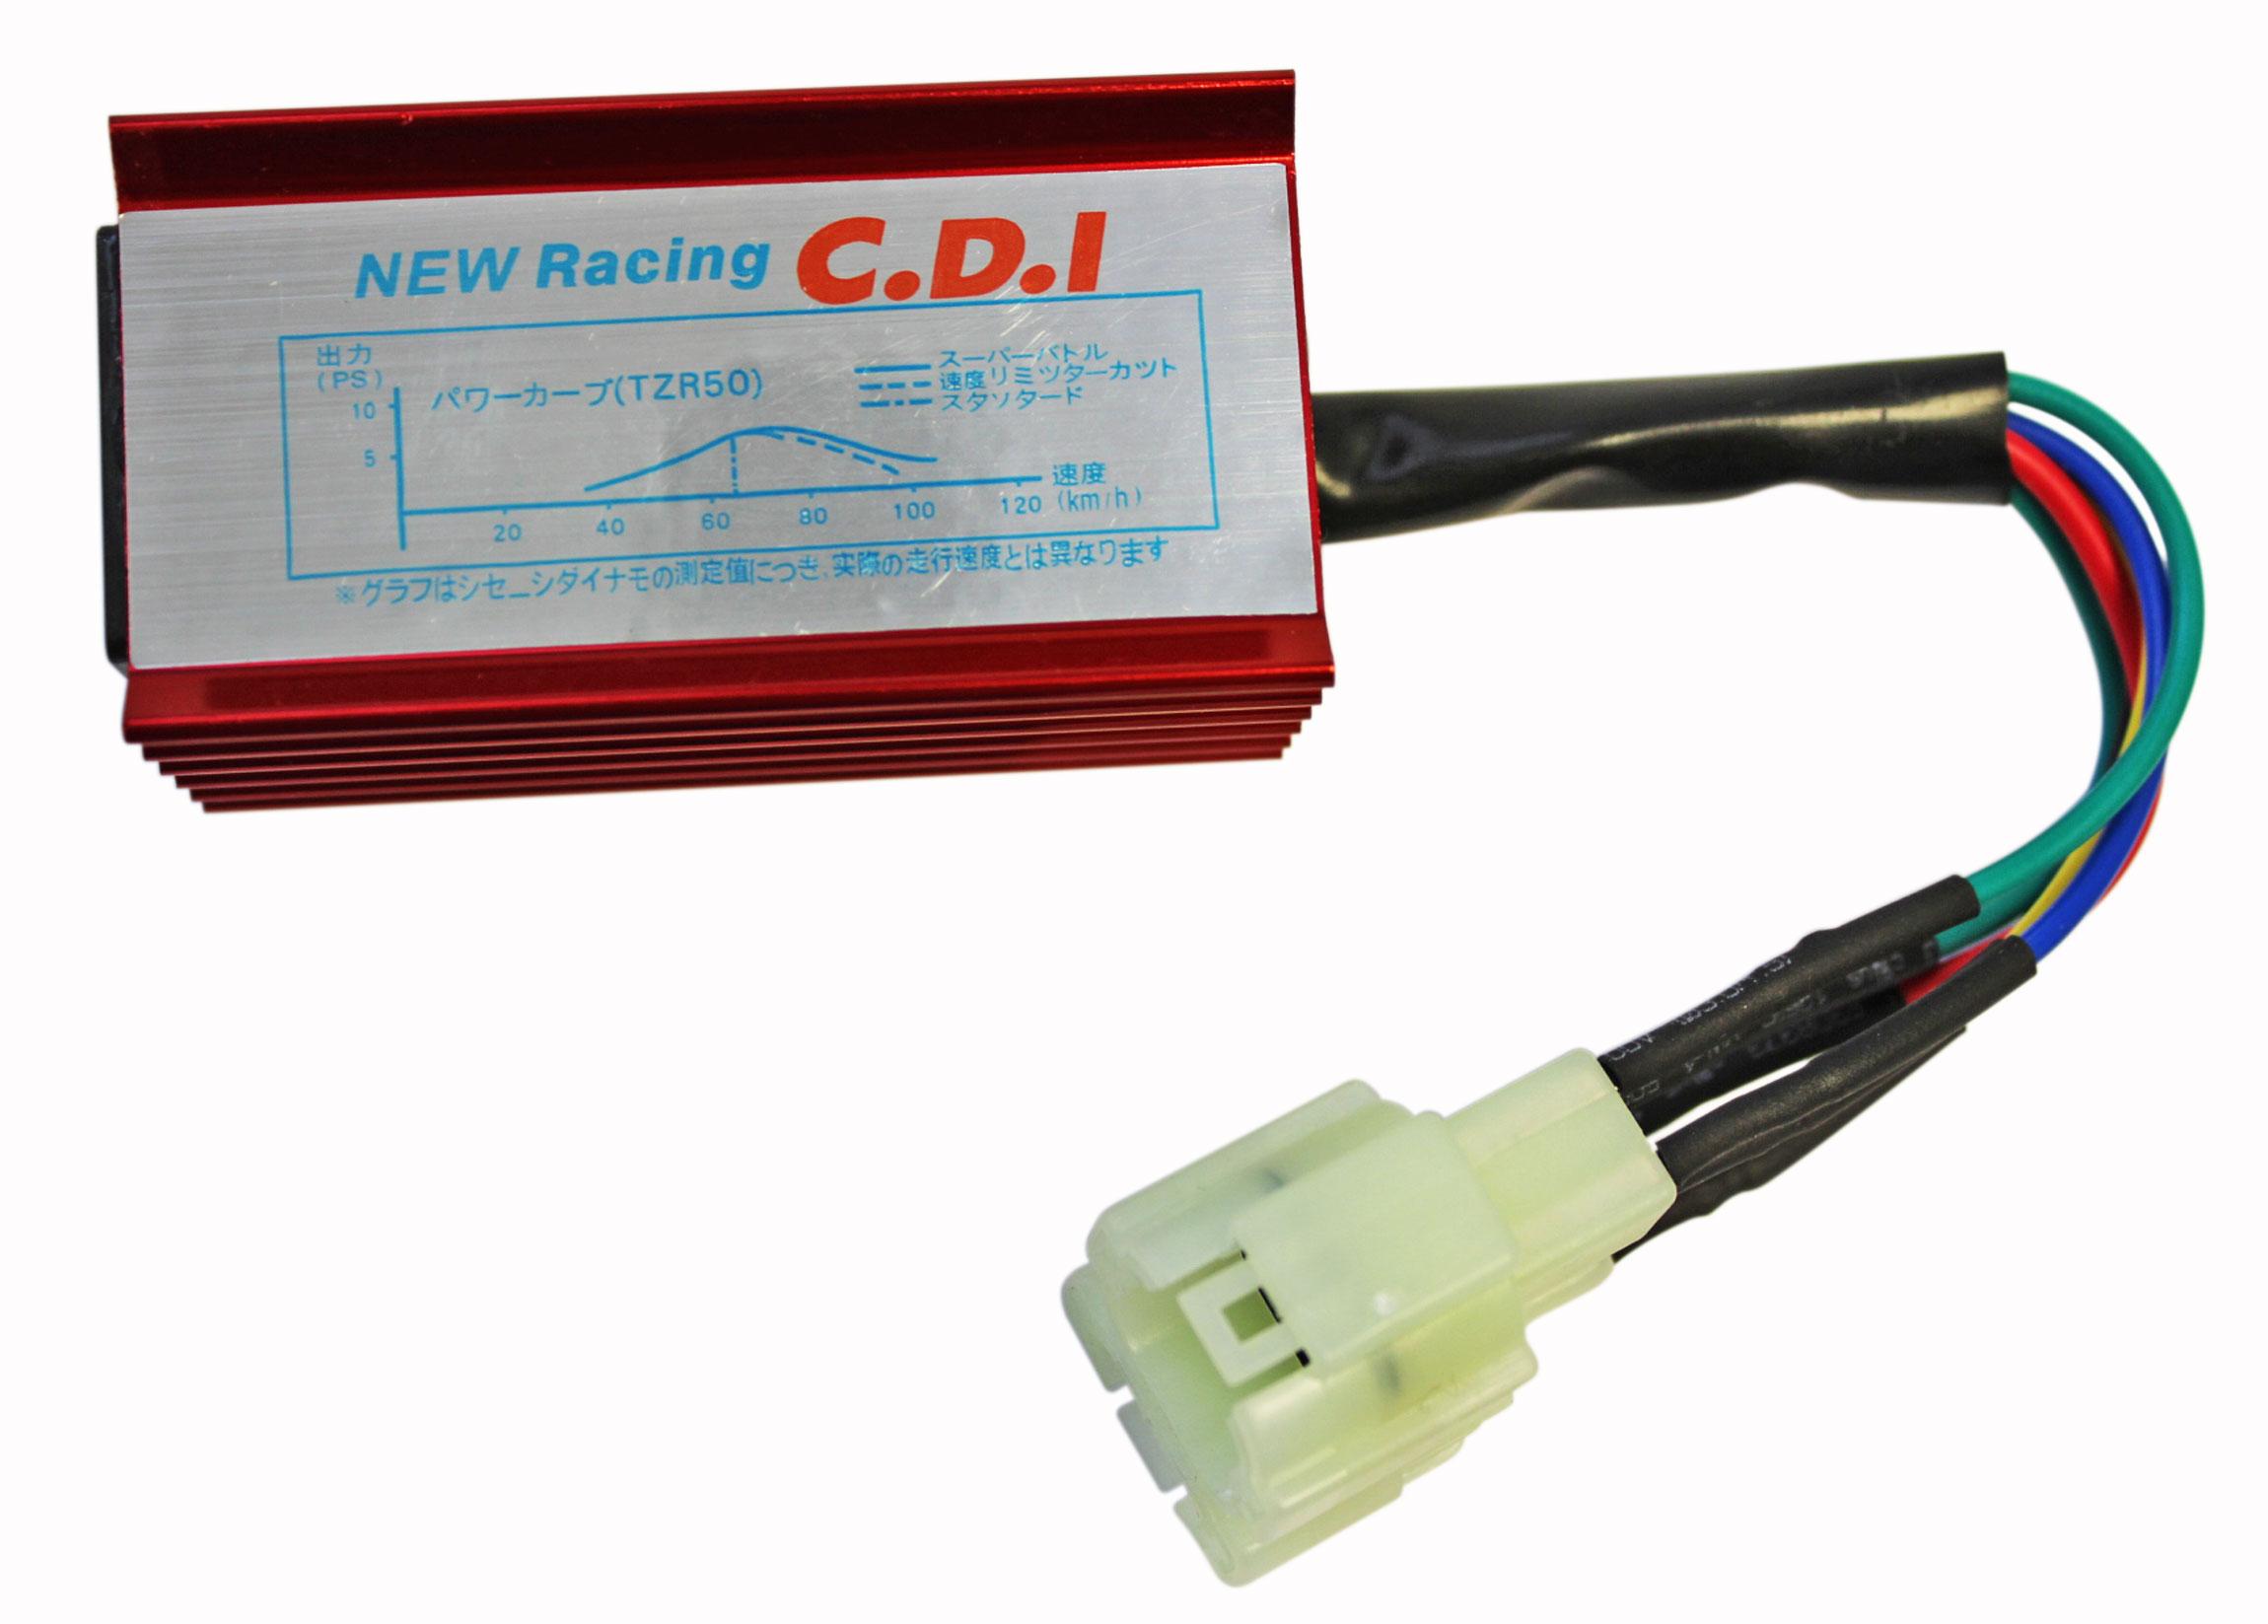 gy6 racing cdi wiring diagram ac racing ac cdi 6 pin  red  for 50cc 150cc gy6 engine 501145  6 pin  red  for 50cc 150cc gy6 engine